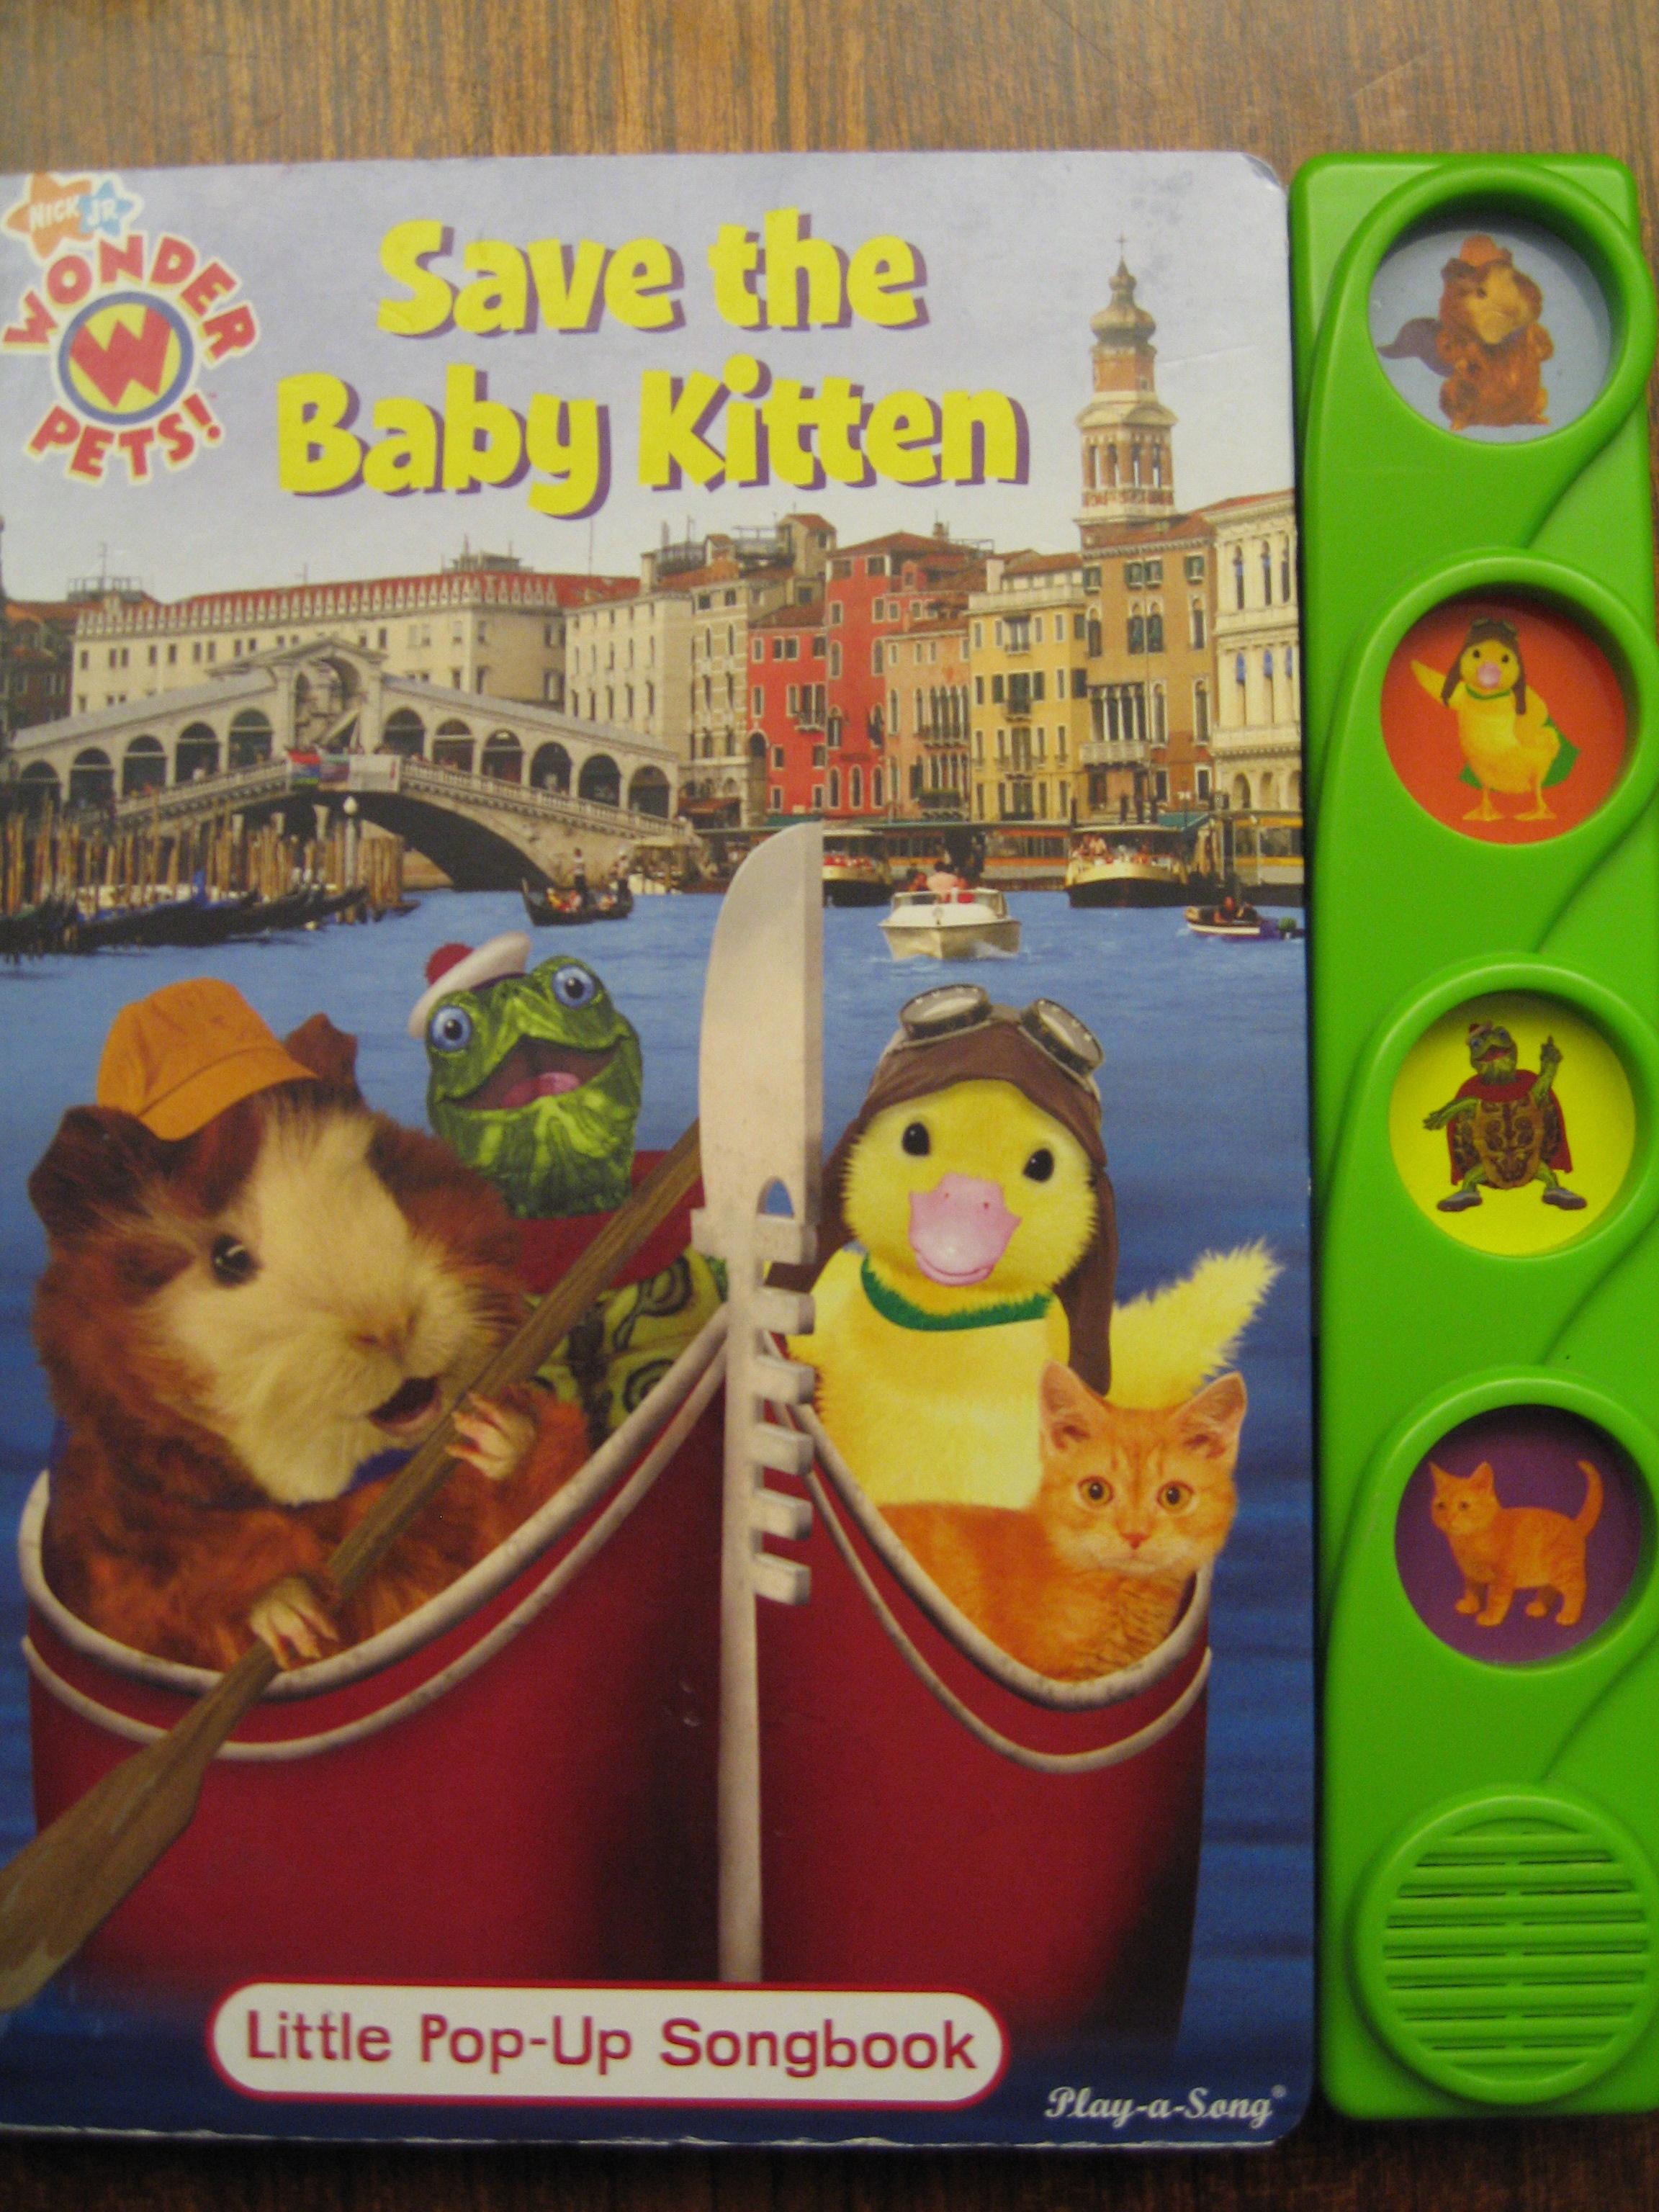 Save the Baby Kitten